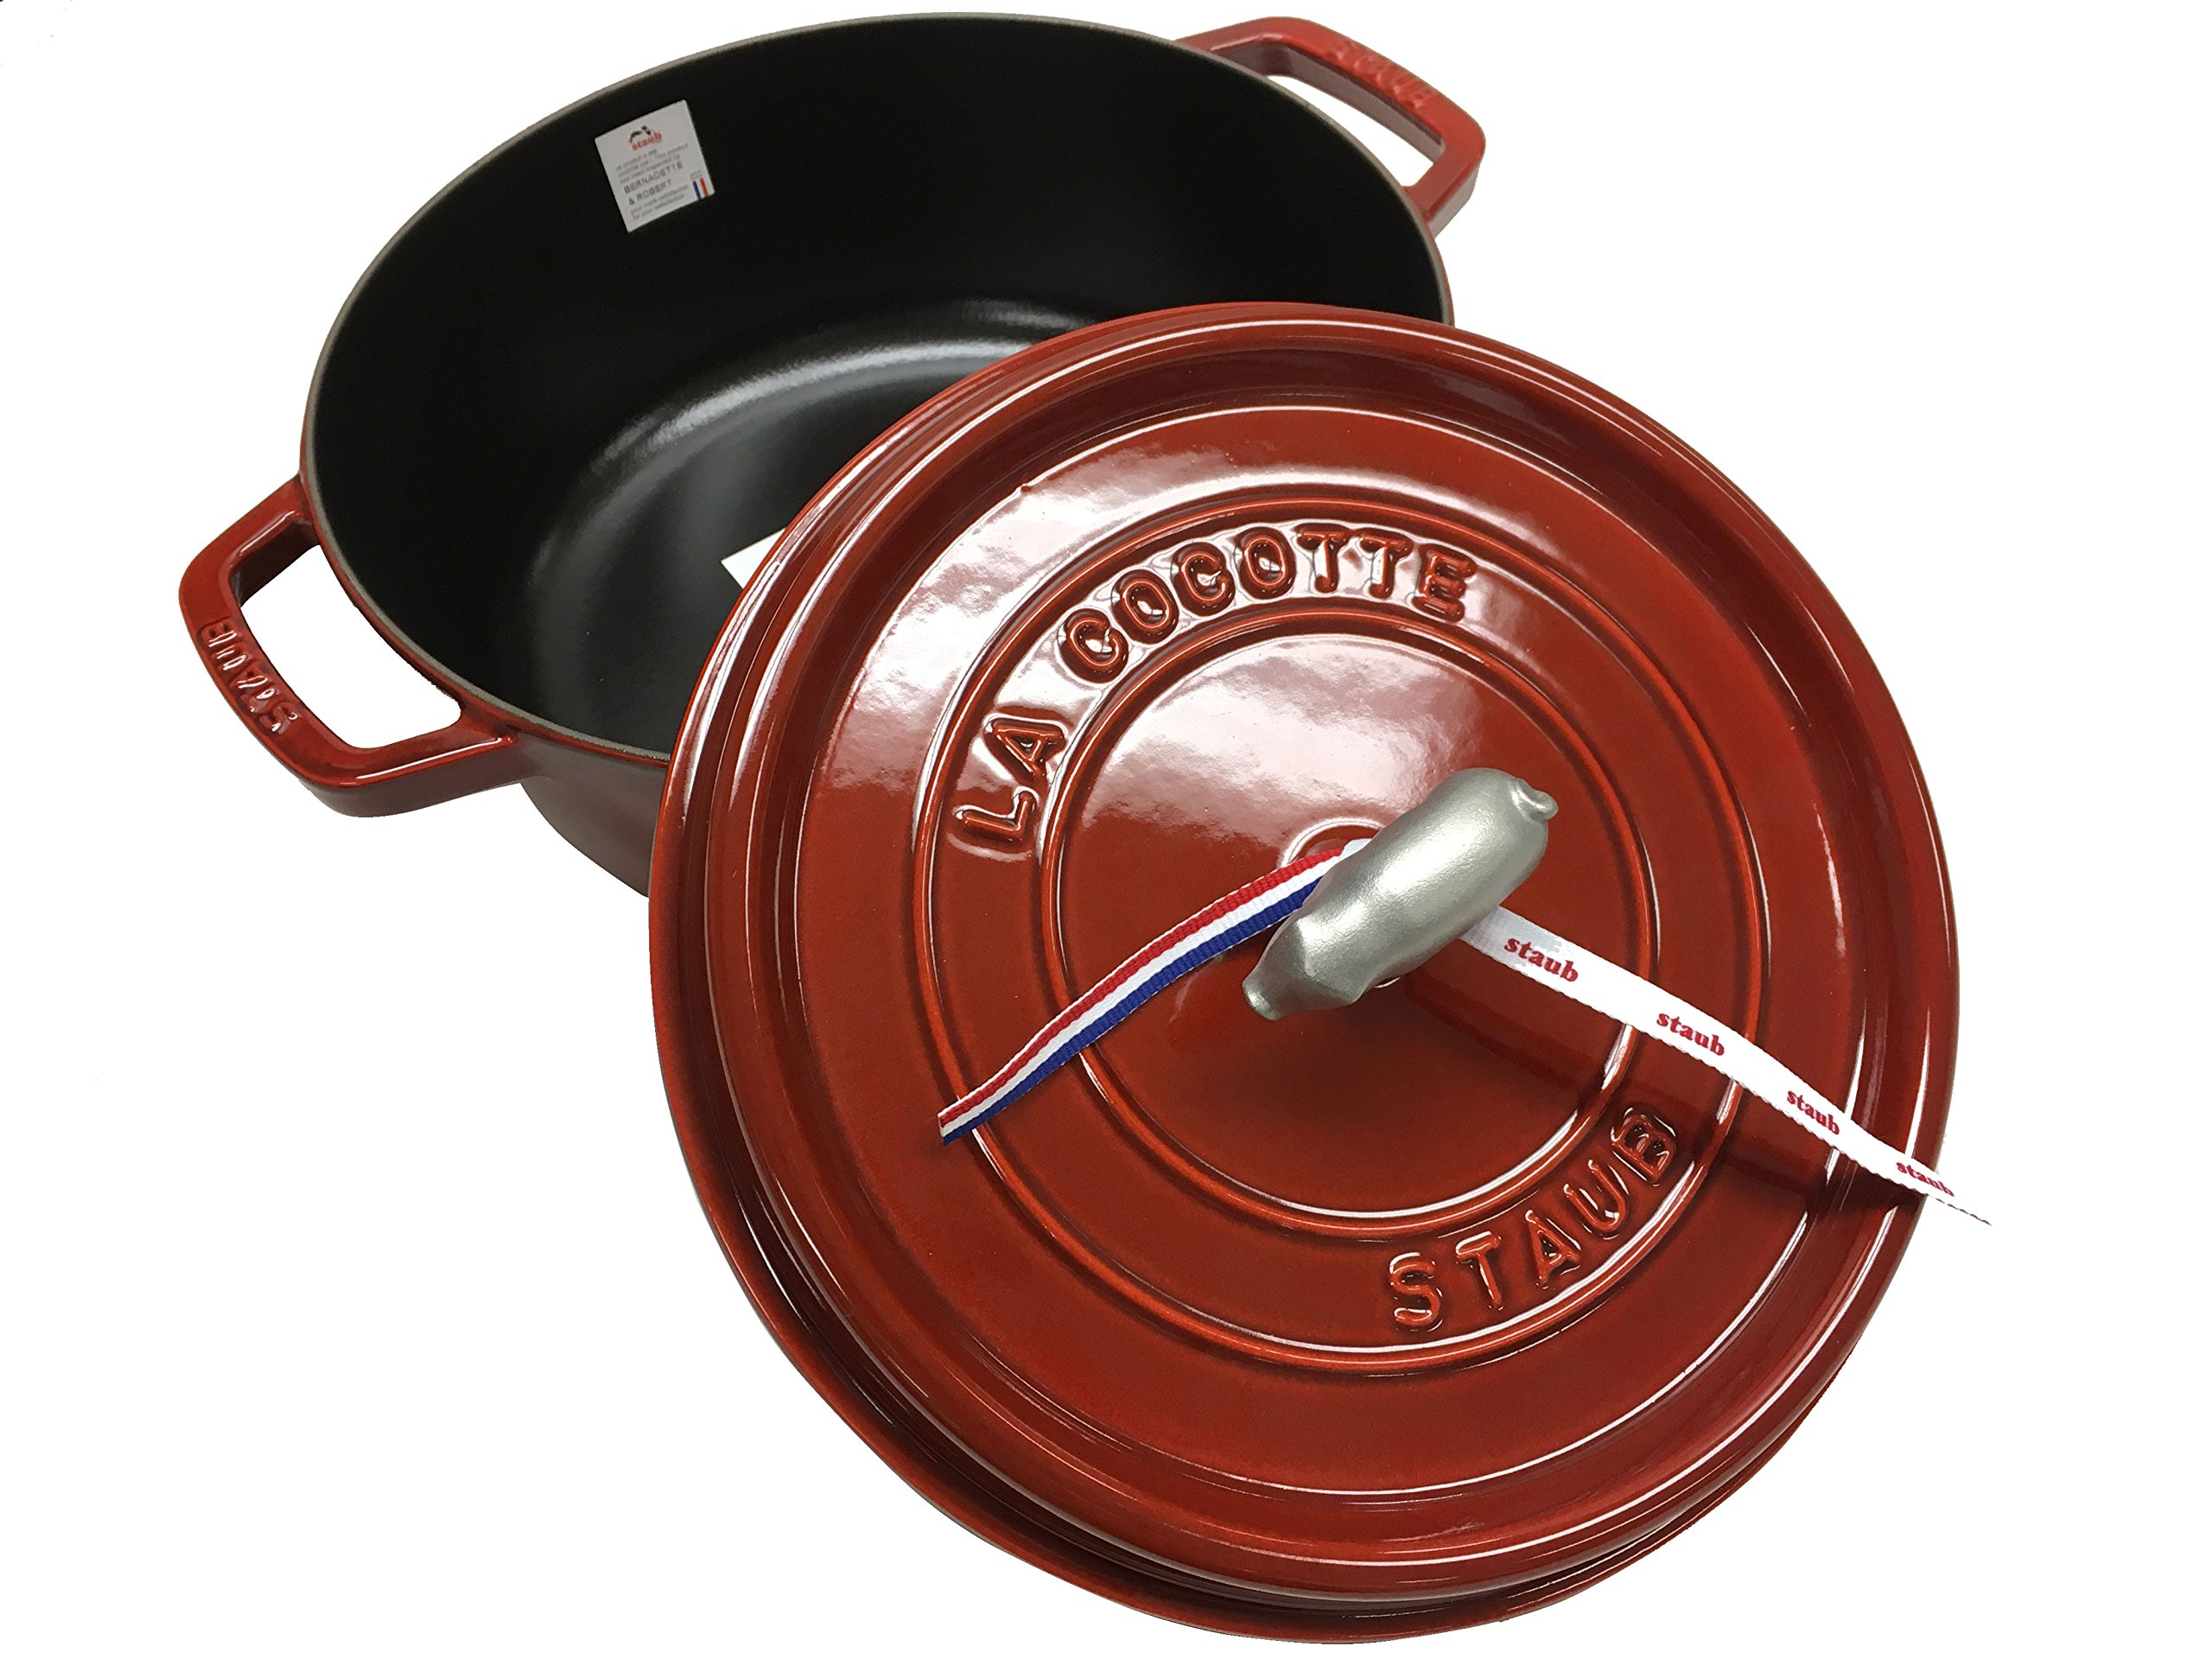 Staub Cast-Iron Wide Round Cocotte, 6 qt. - Grenadine with Pig Knob